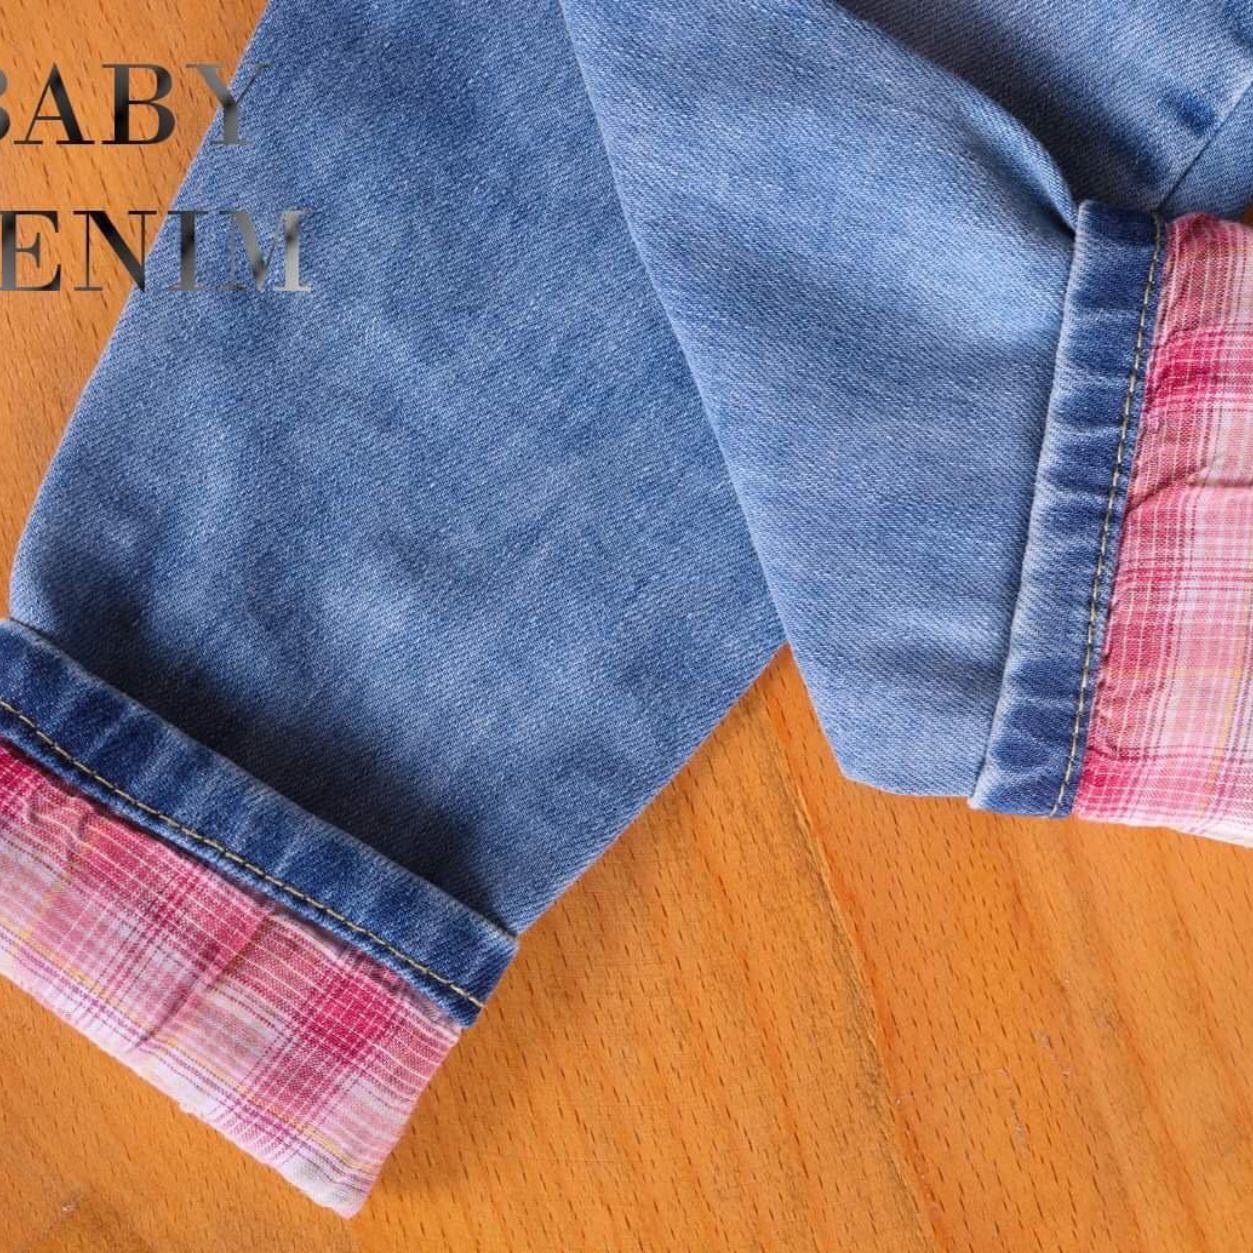 Jeans Baby Fit Denim Button Up Button Up Shirts Up Shirt